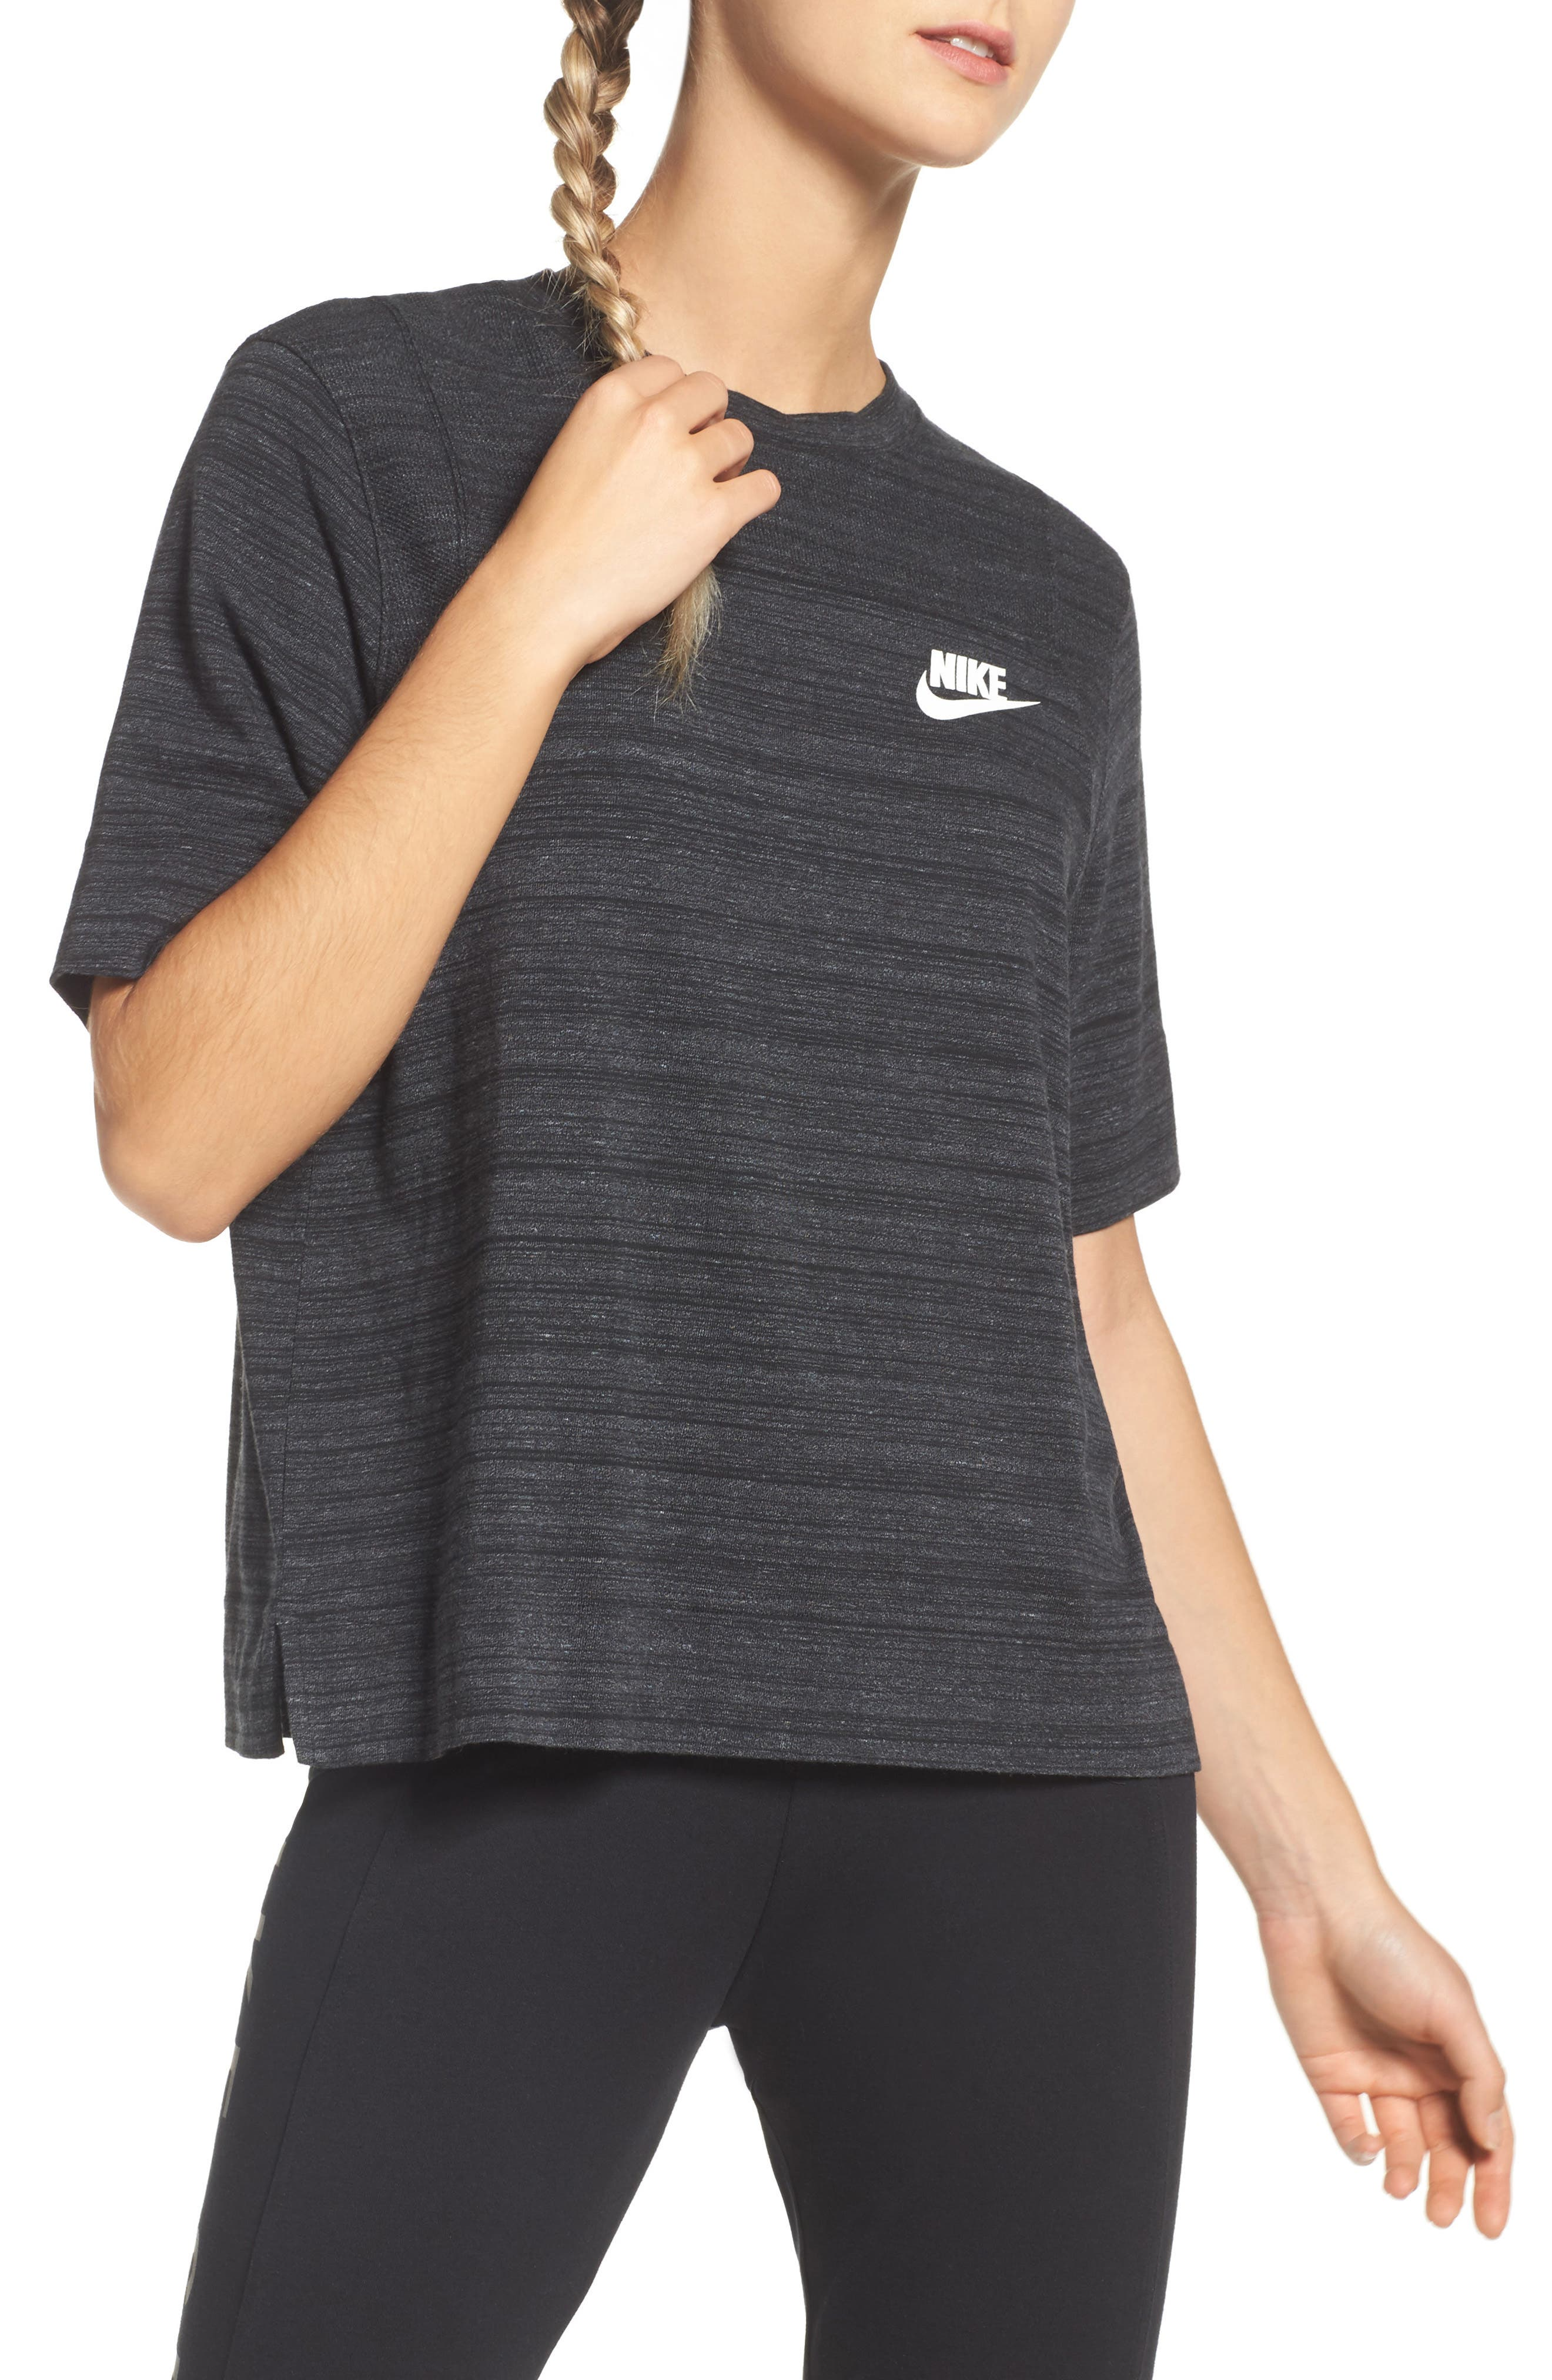 Main Image - Nike Advance 15 Top